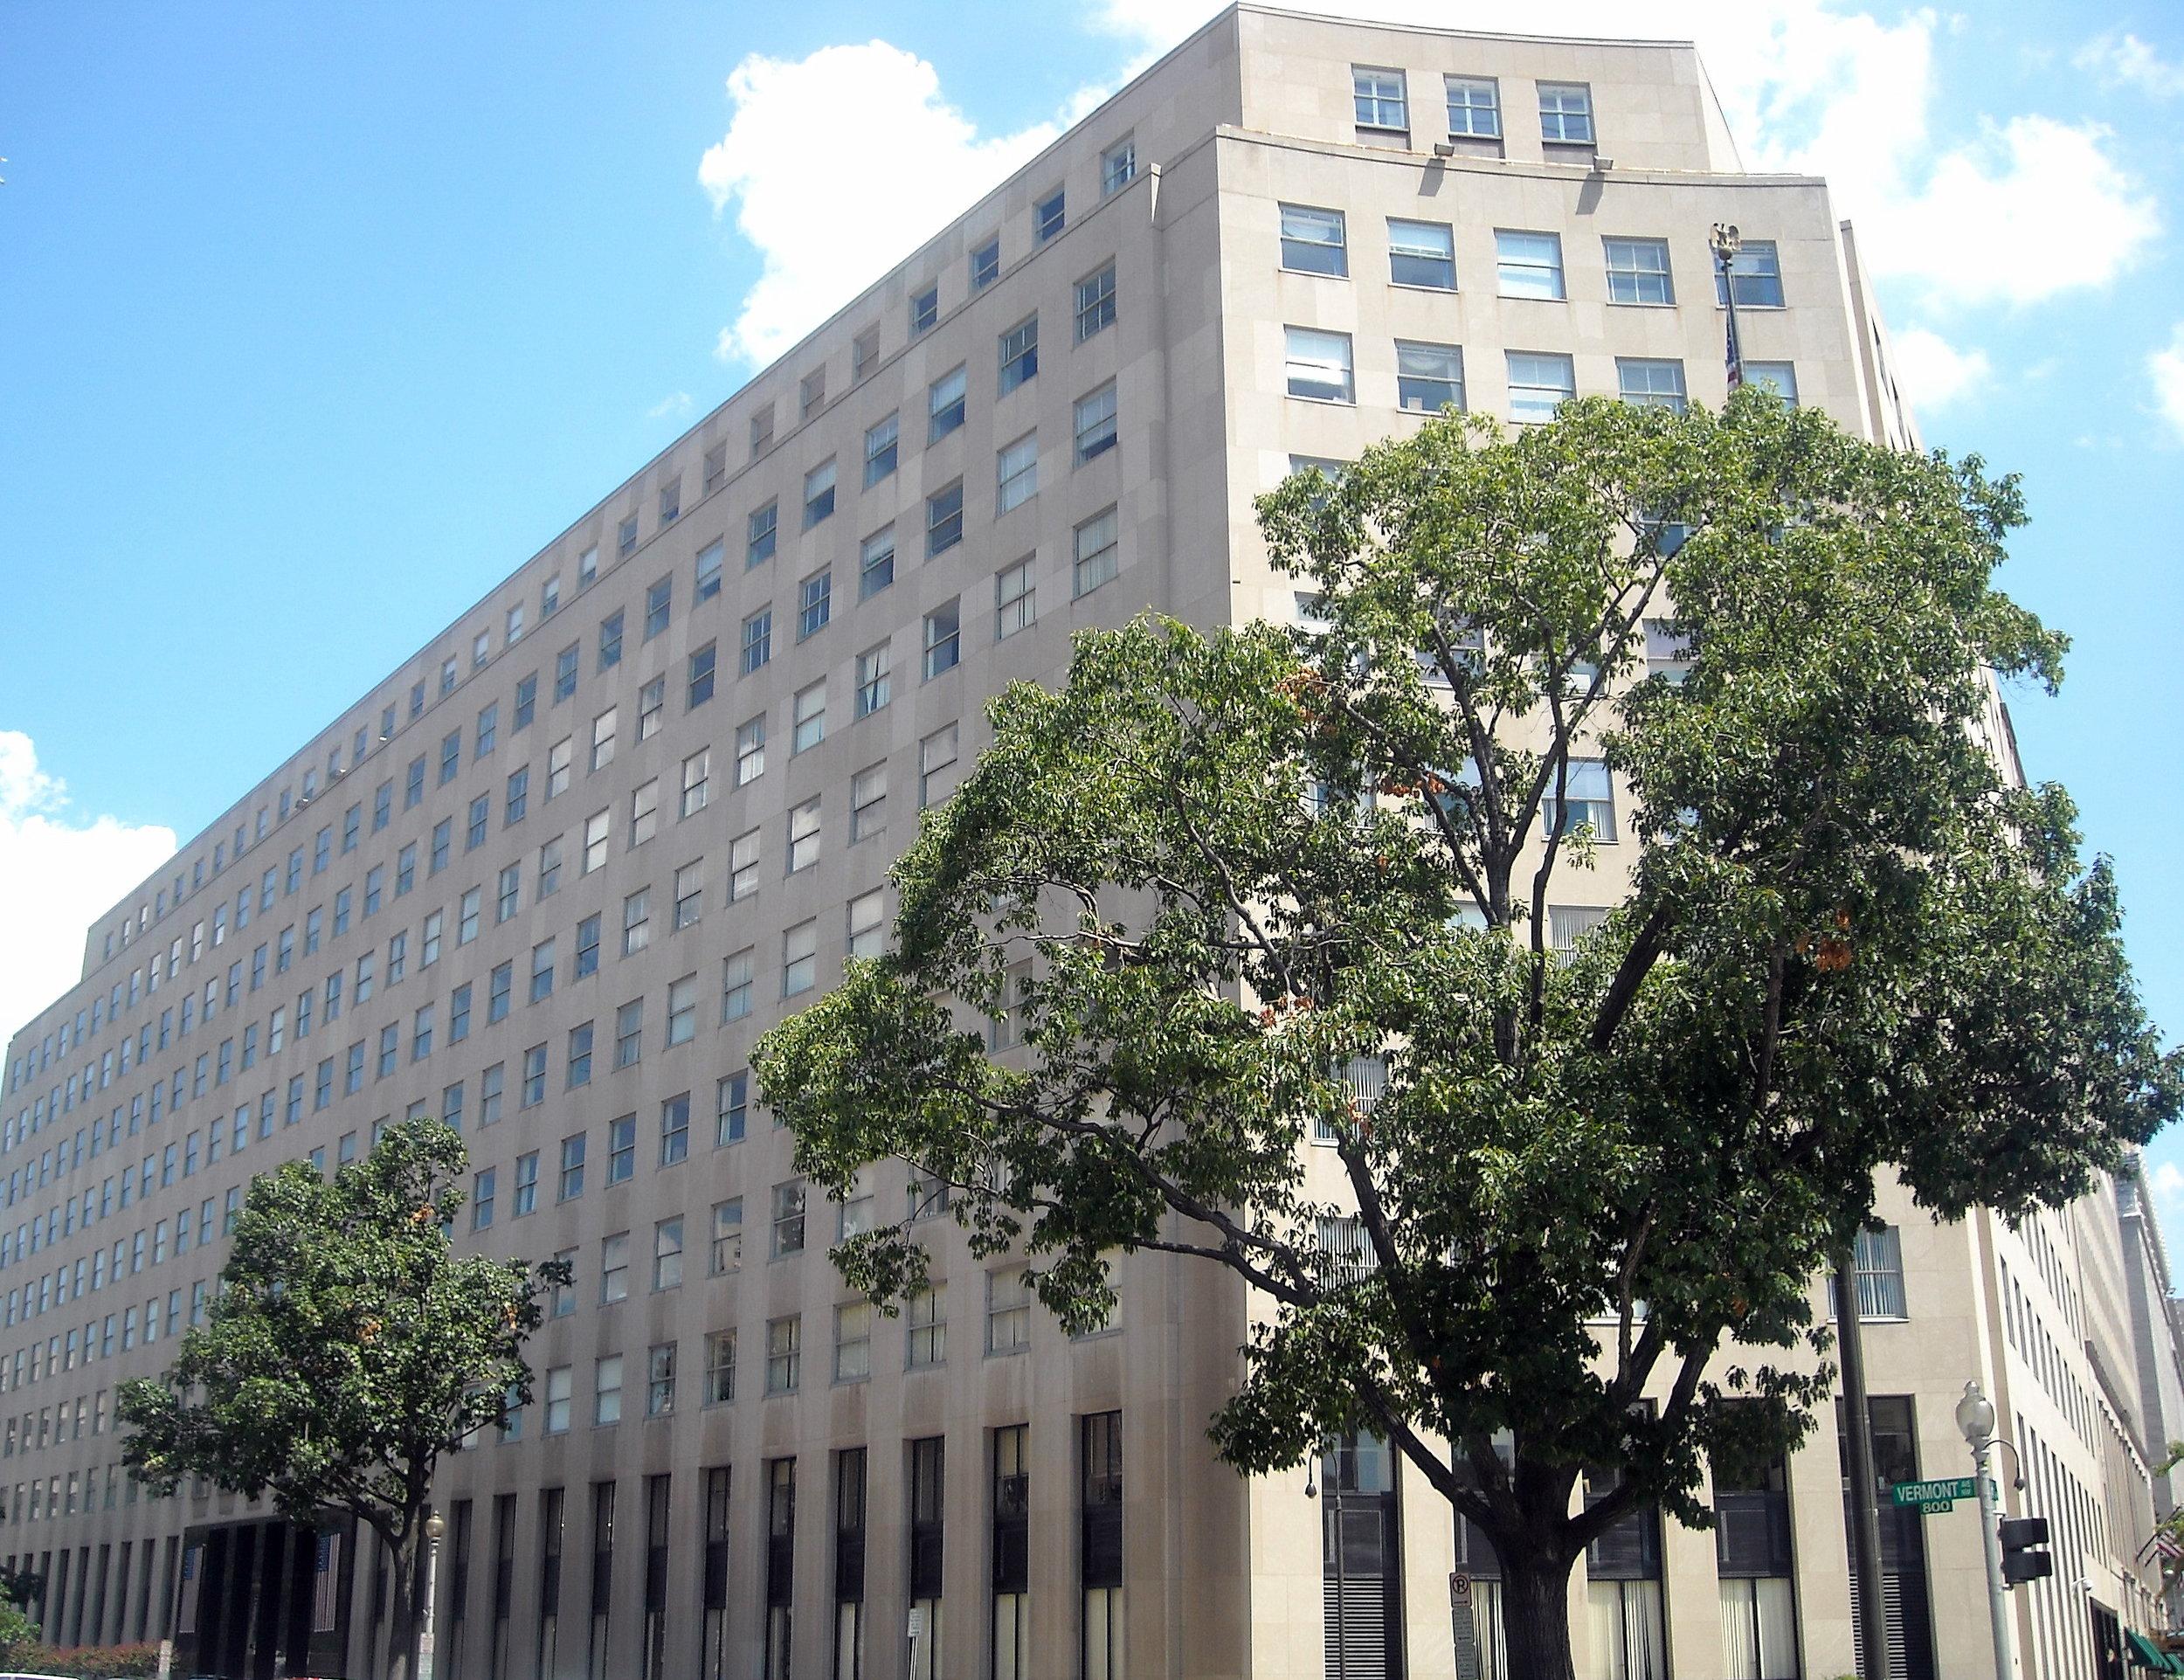 Lafeyette_Building_Washington_DC.JPG